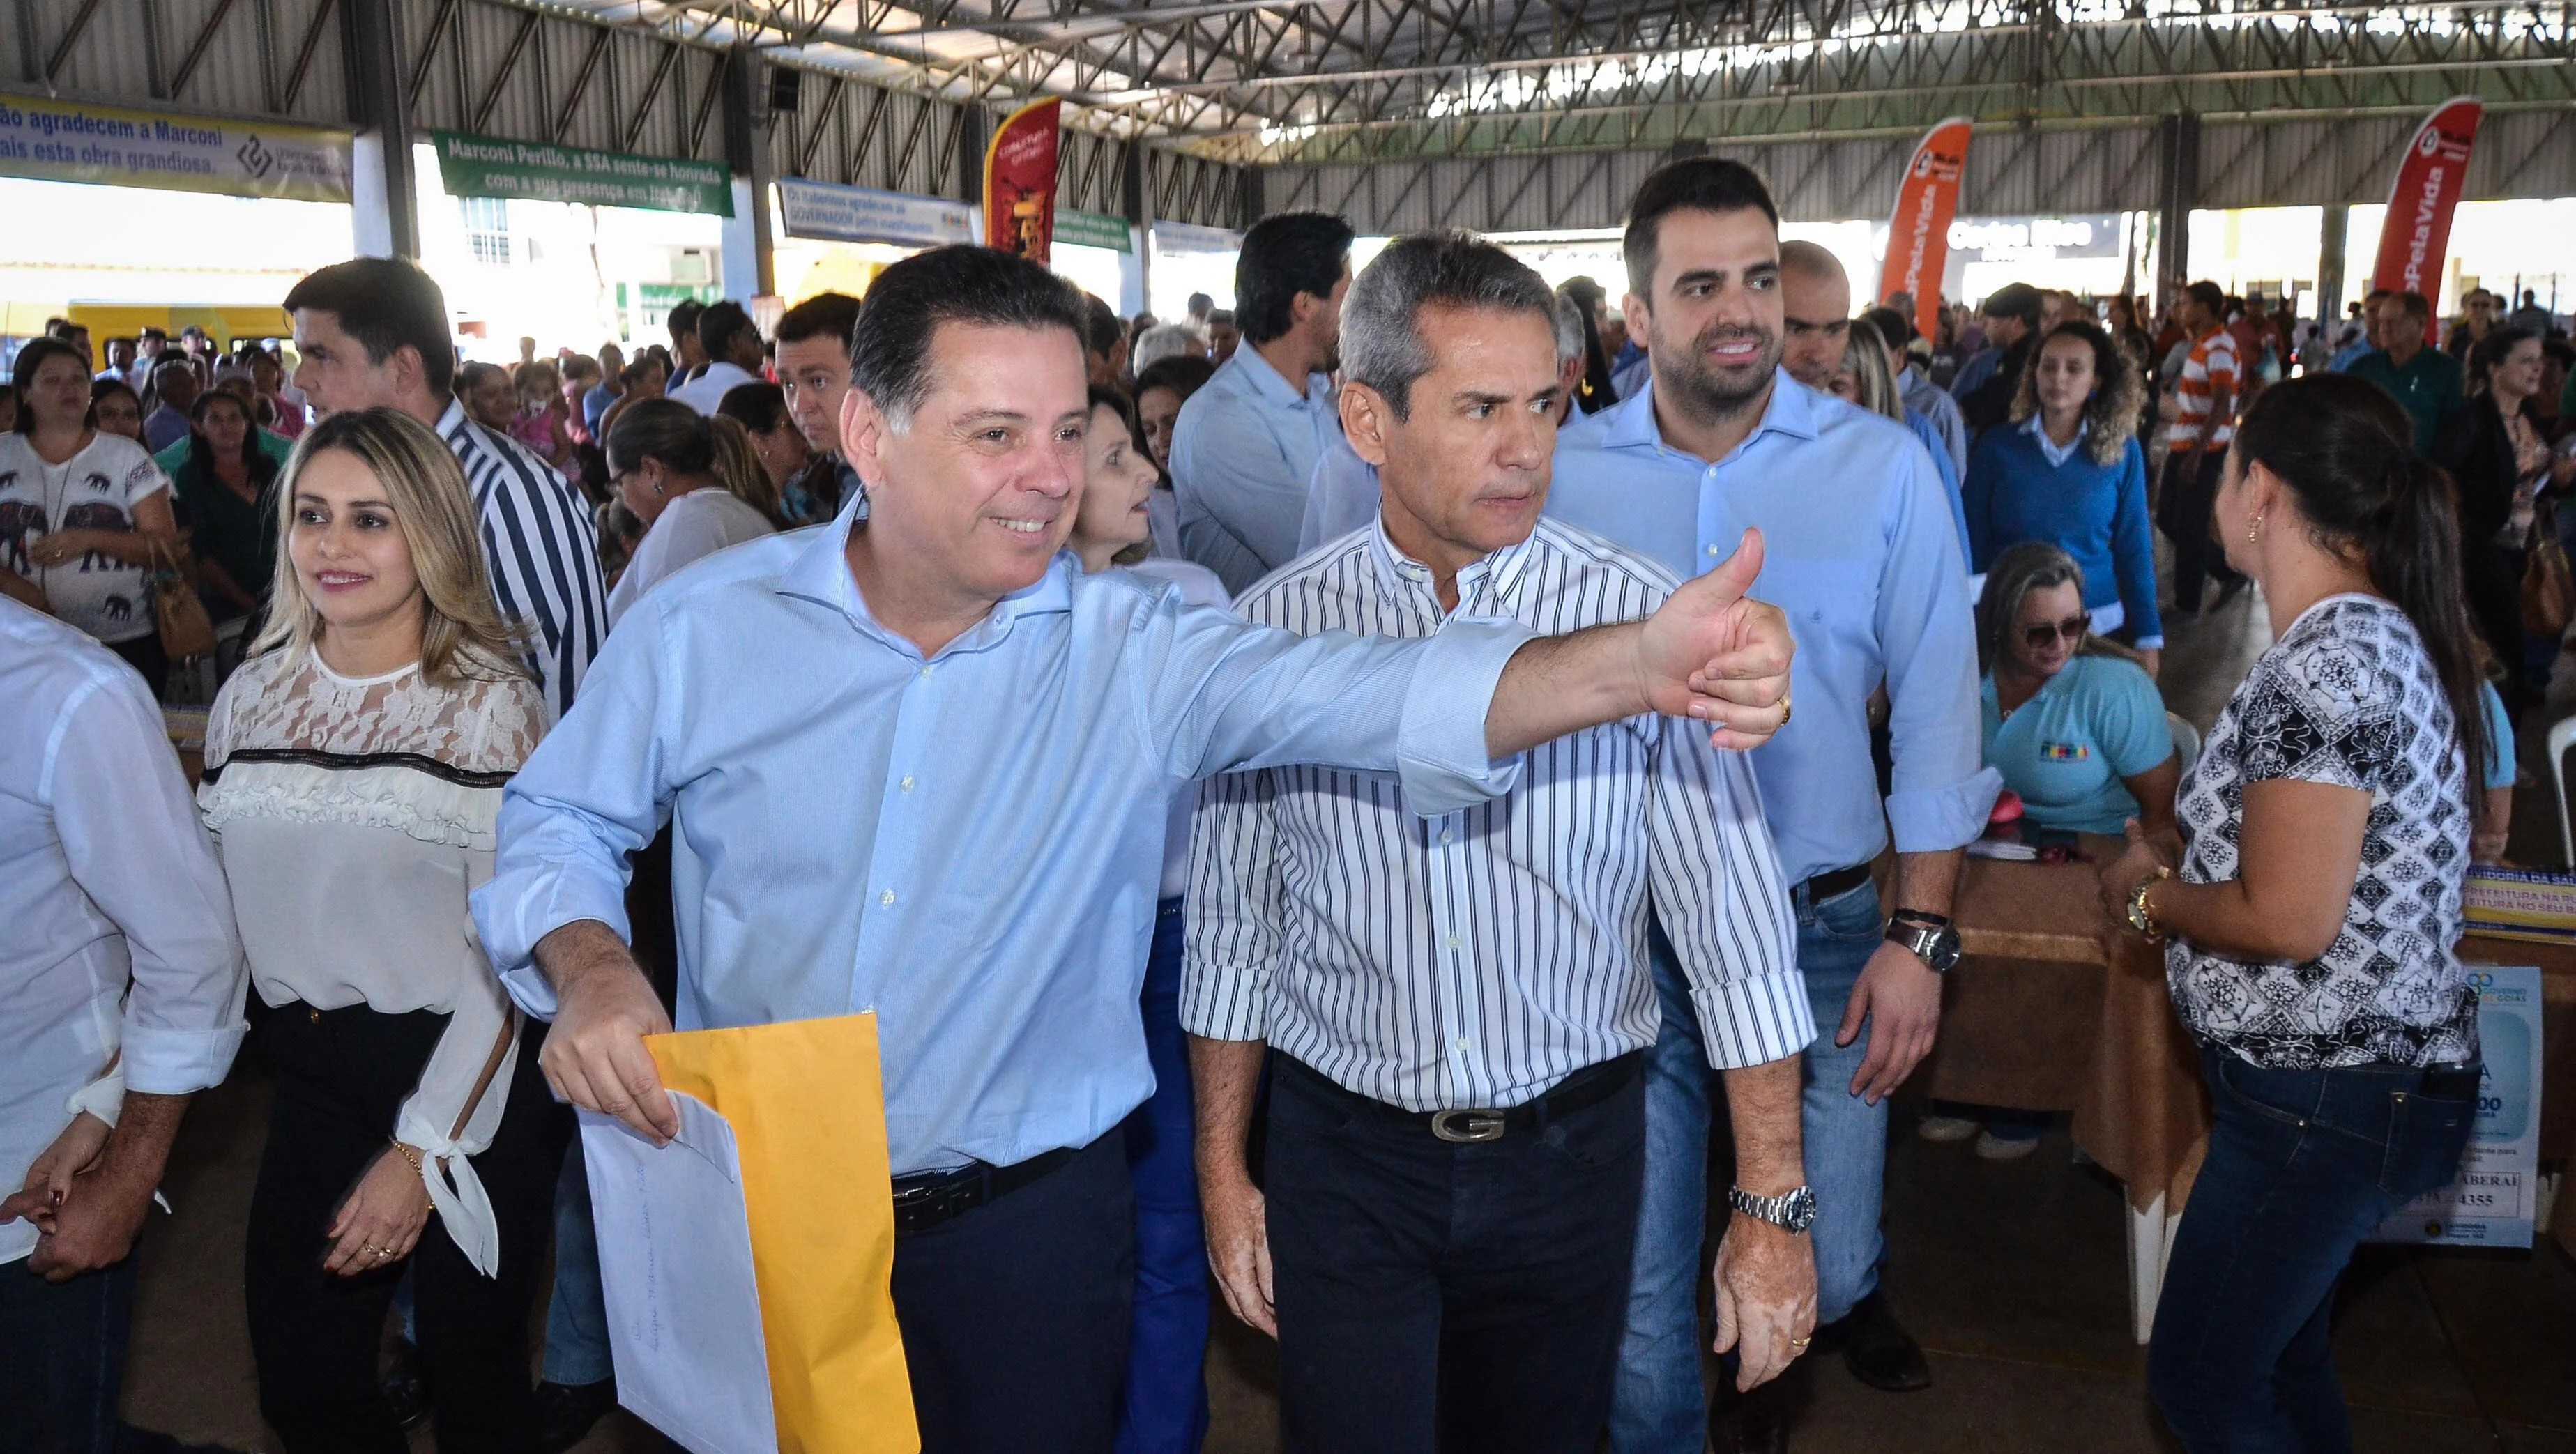 Goiás na Frente turbina Marconi e a base aliada para 2018